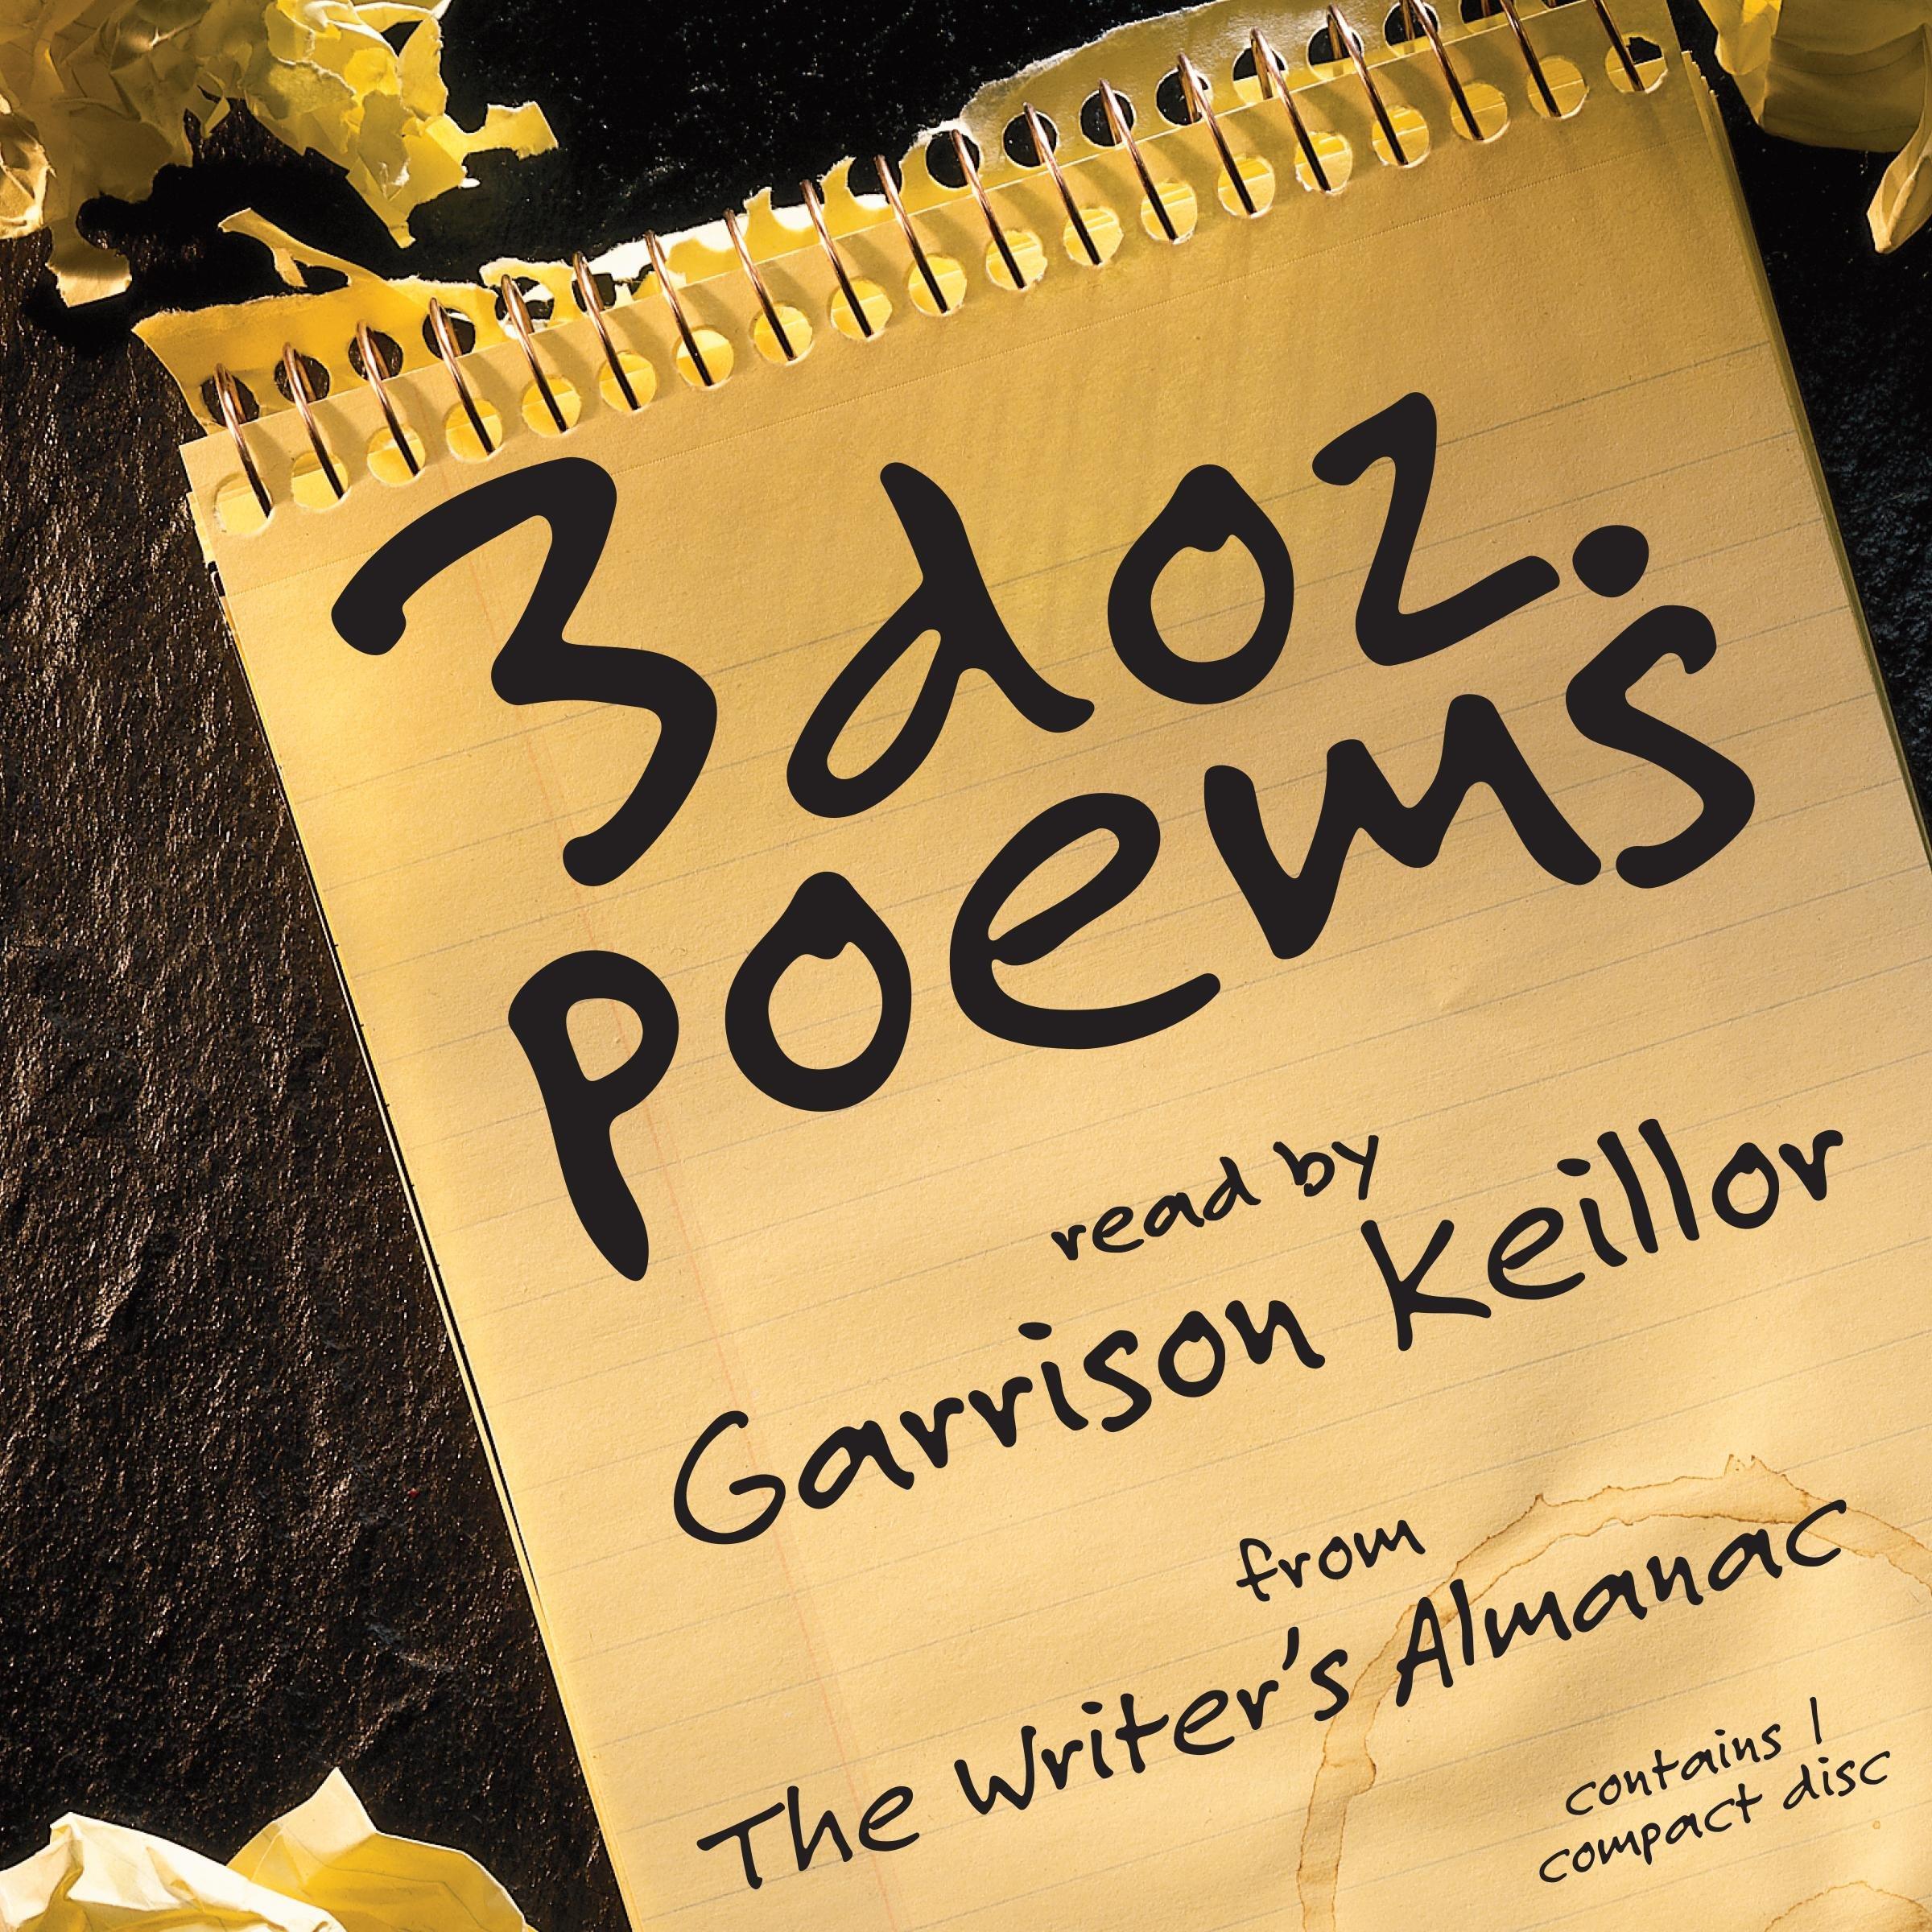 3 Dozen Poems: From the Writer's Almanac: Garrison Keillor: 0025024458187:  Amazon.com: Books